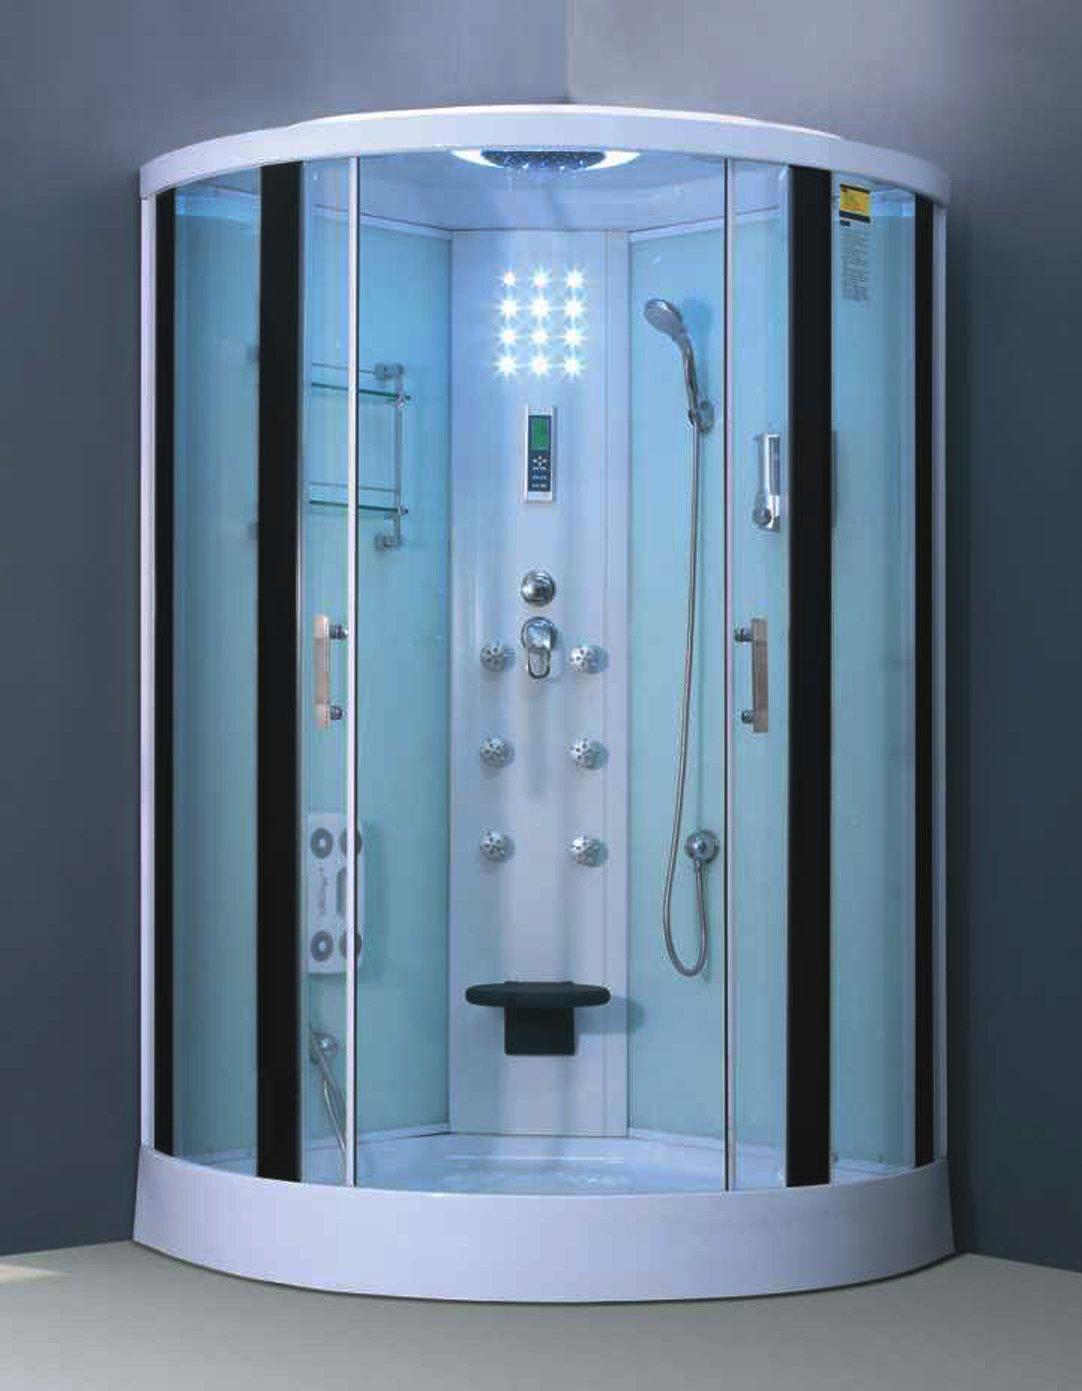 Luxury European Style Shower Enclosure S-4848 - - Amazon.com